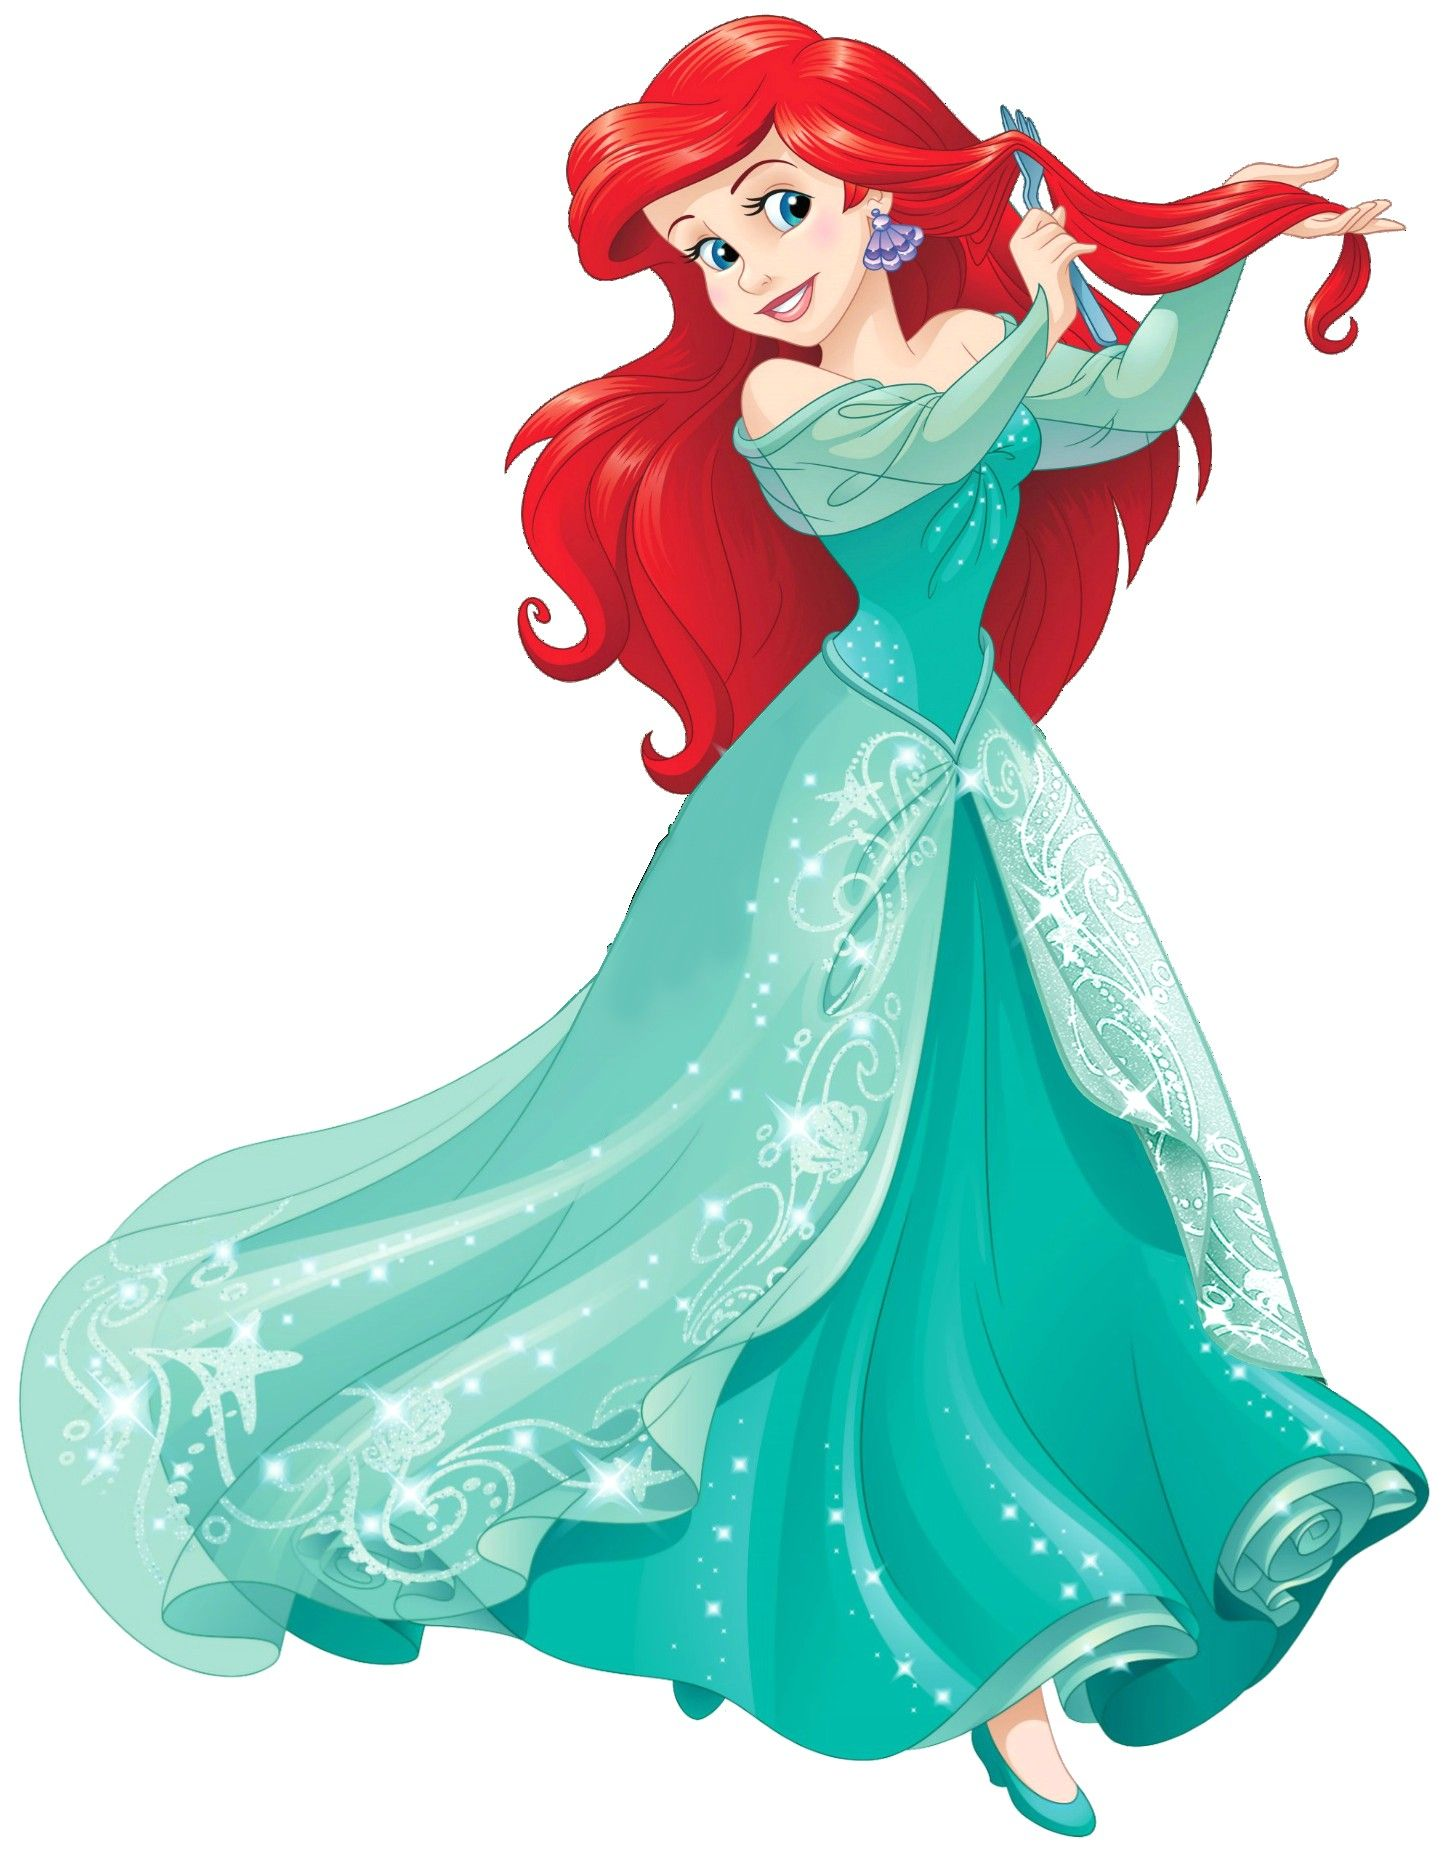 Ariel clipart real life. Disney little mermaid princess